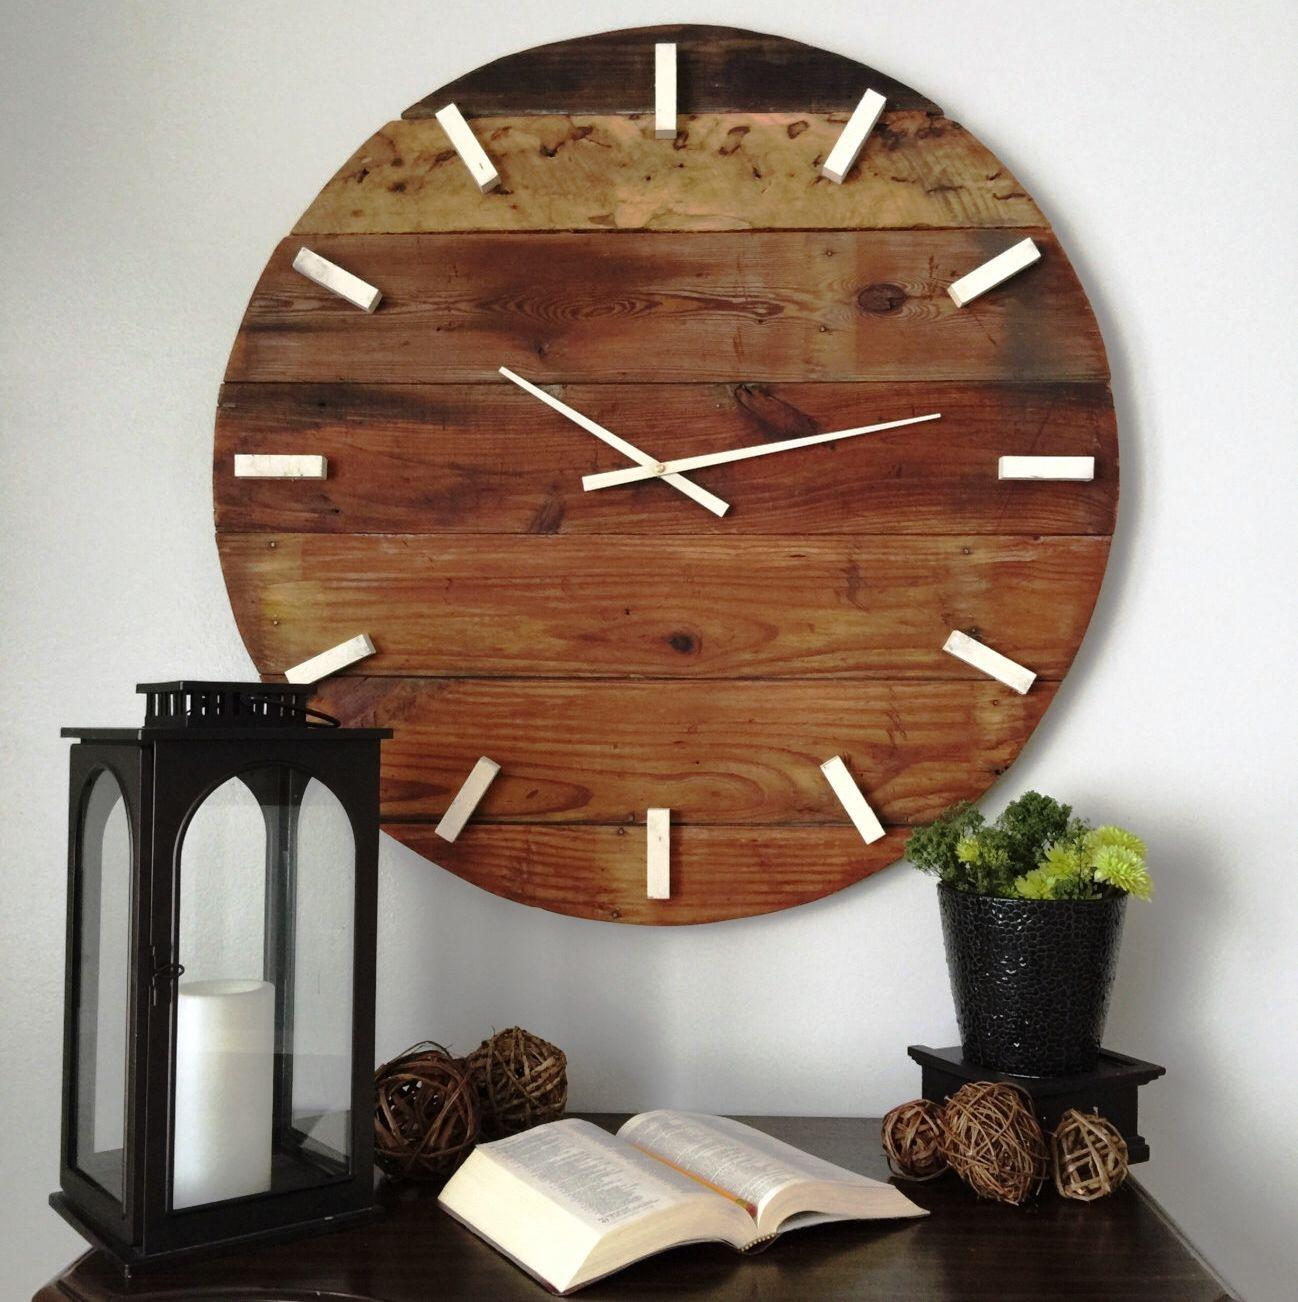 17 mejores imágenes de Reloj | Reloj, Relojes de madera